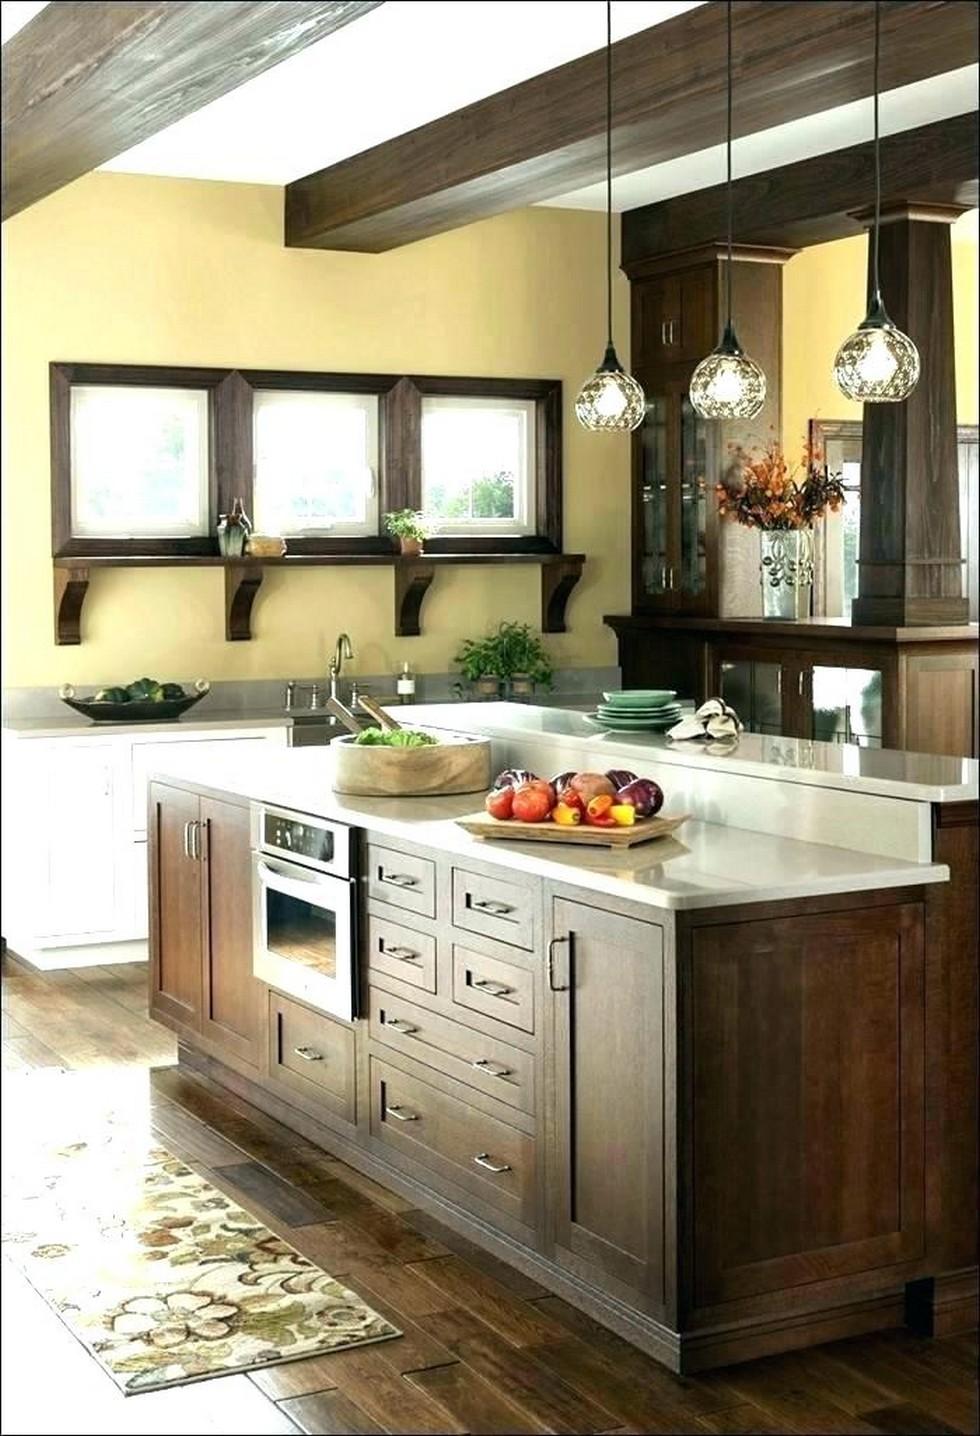 Amazing Concept of Kitchen Architecture Idea